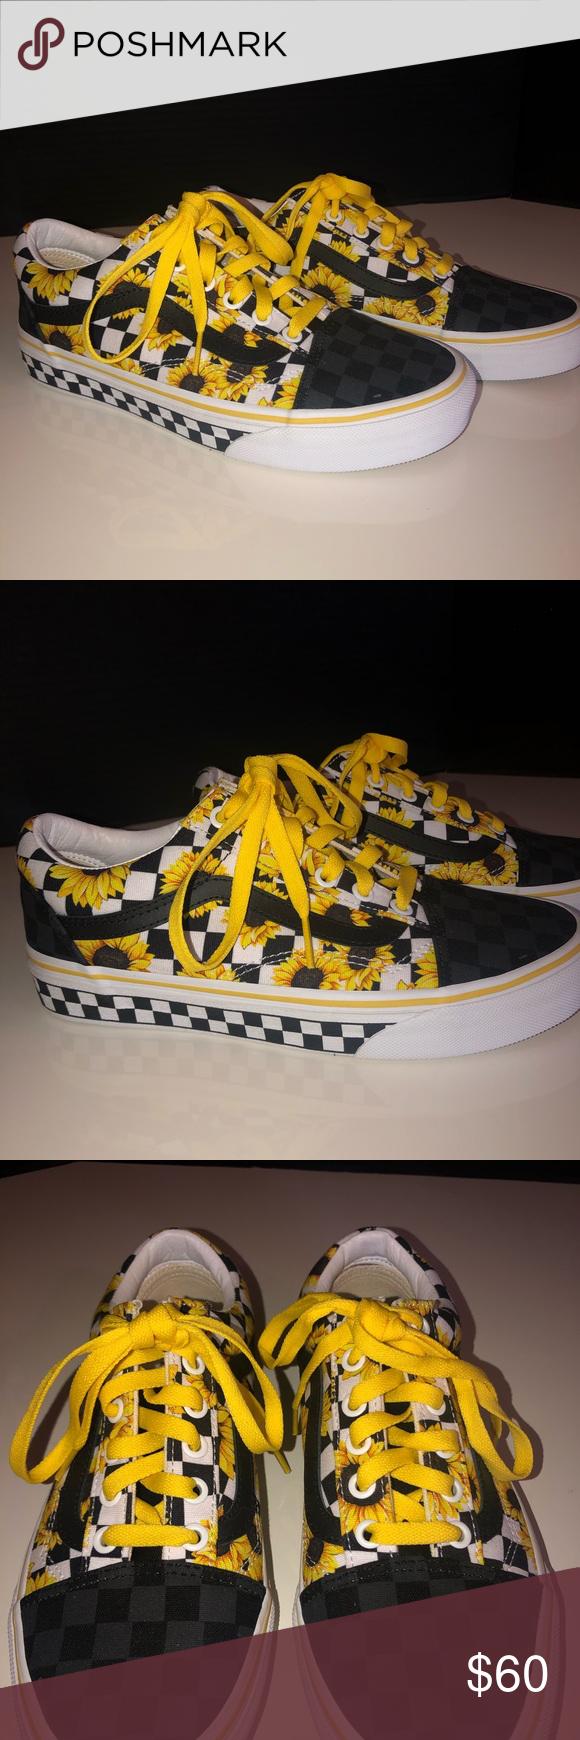 Vans Customs Sunflower Old Skool Shoe